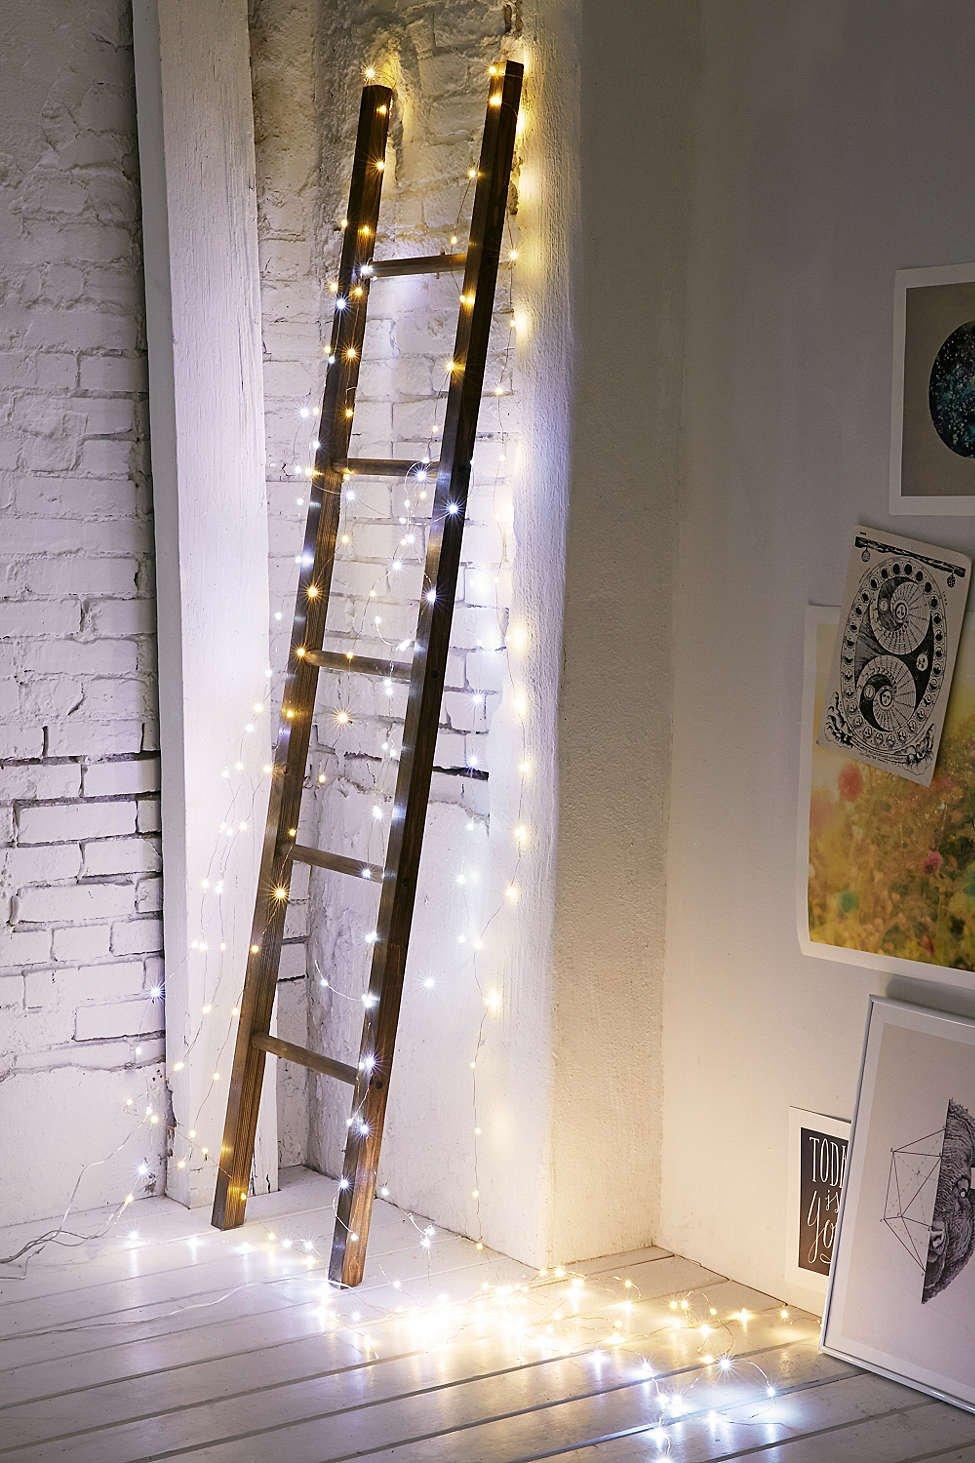 make-decorative-ladder-christmas-ready-encasing-lights.jpg